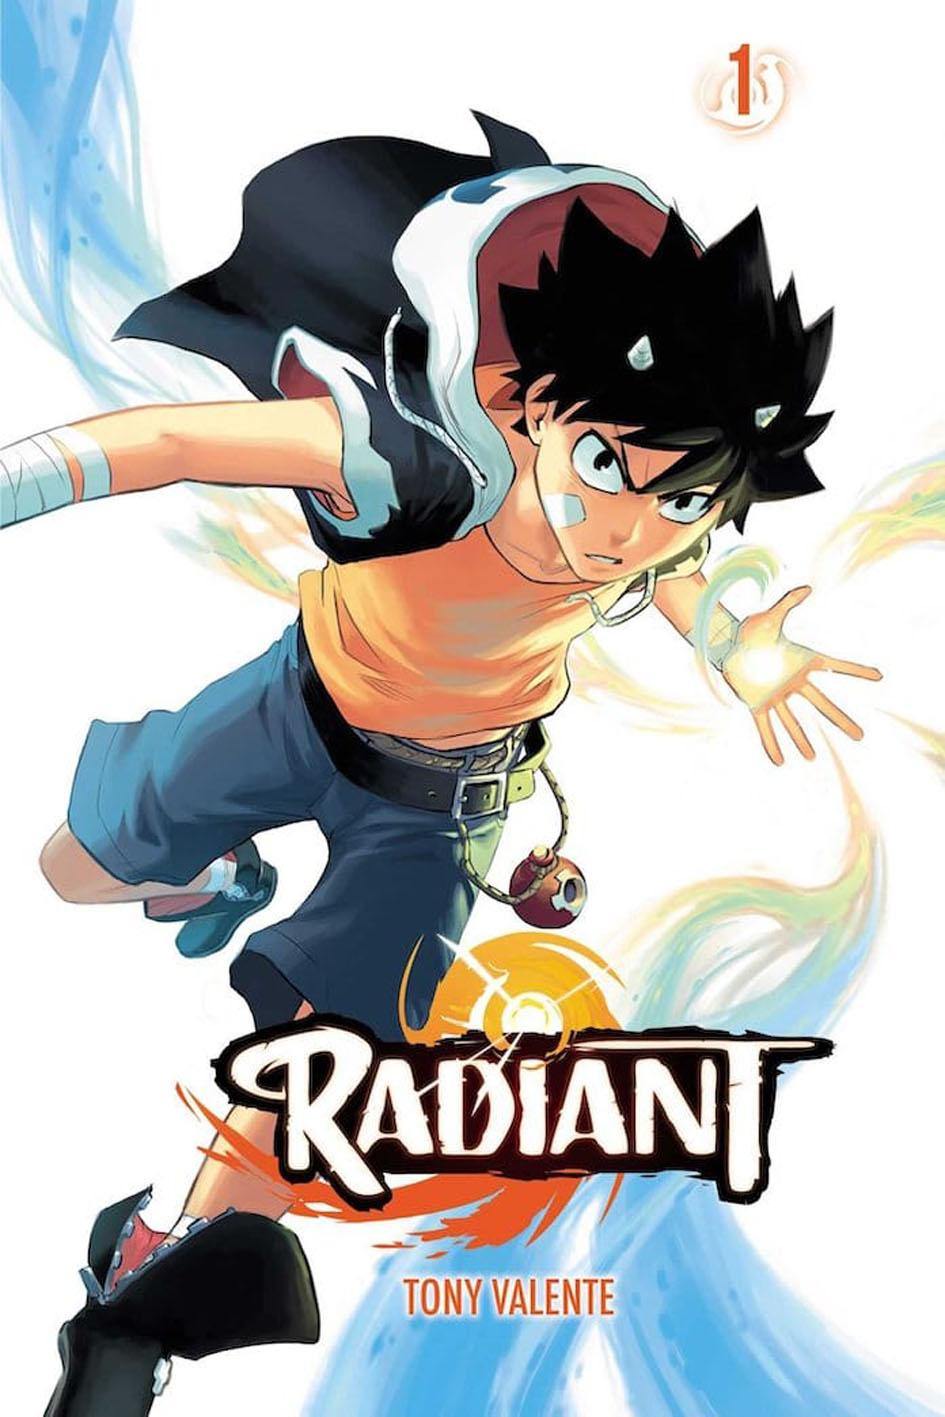 Radiant. Venti d'Oriente nel manga europeo